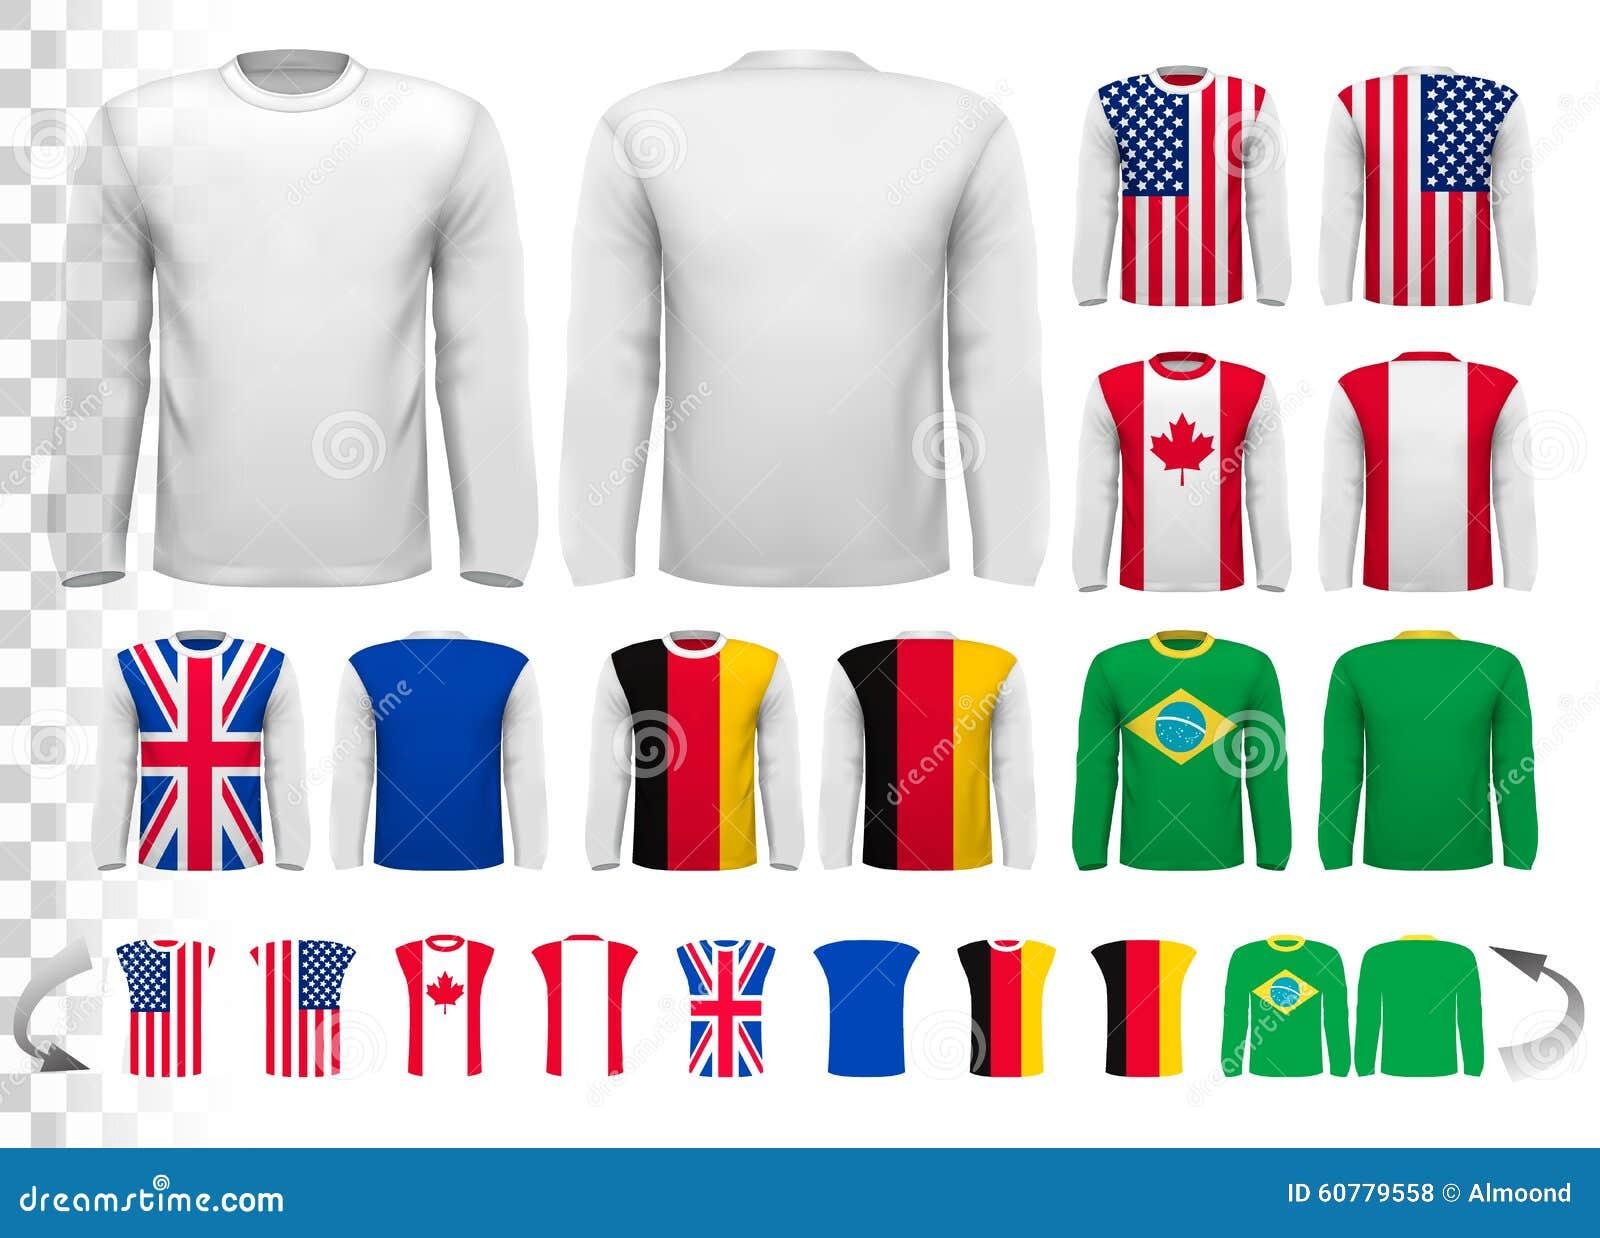 Colección de diversas camisas con mangas largas masculinas